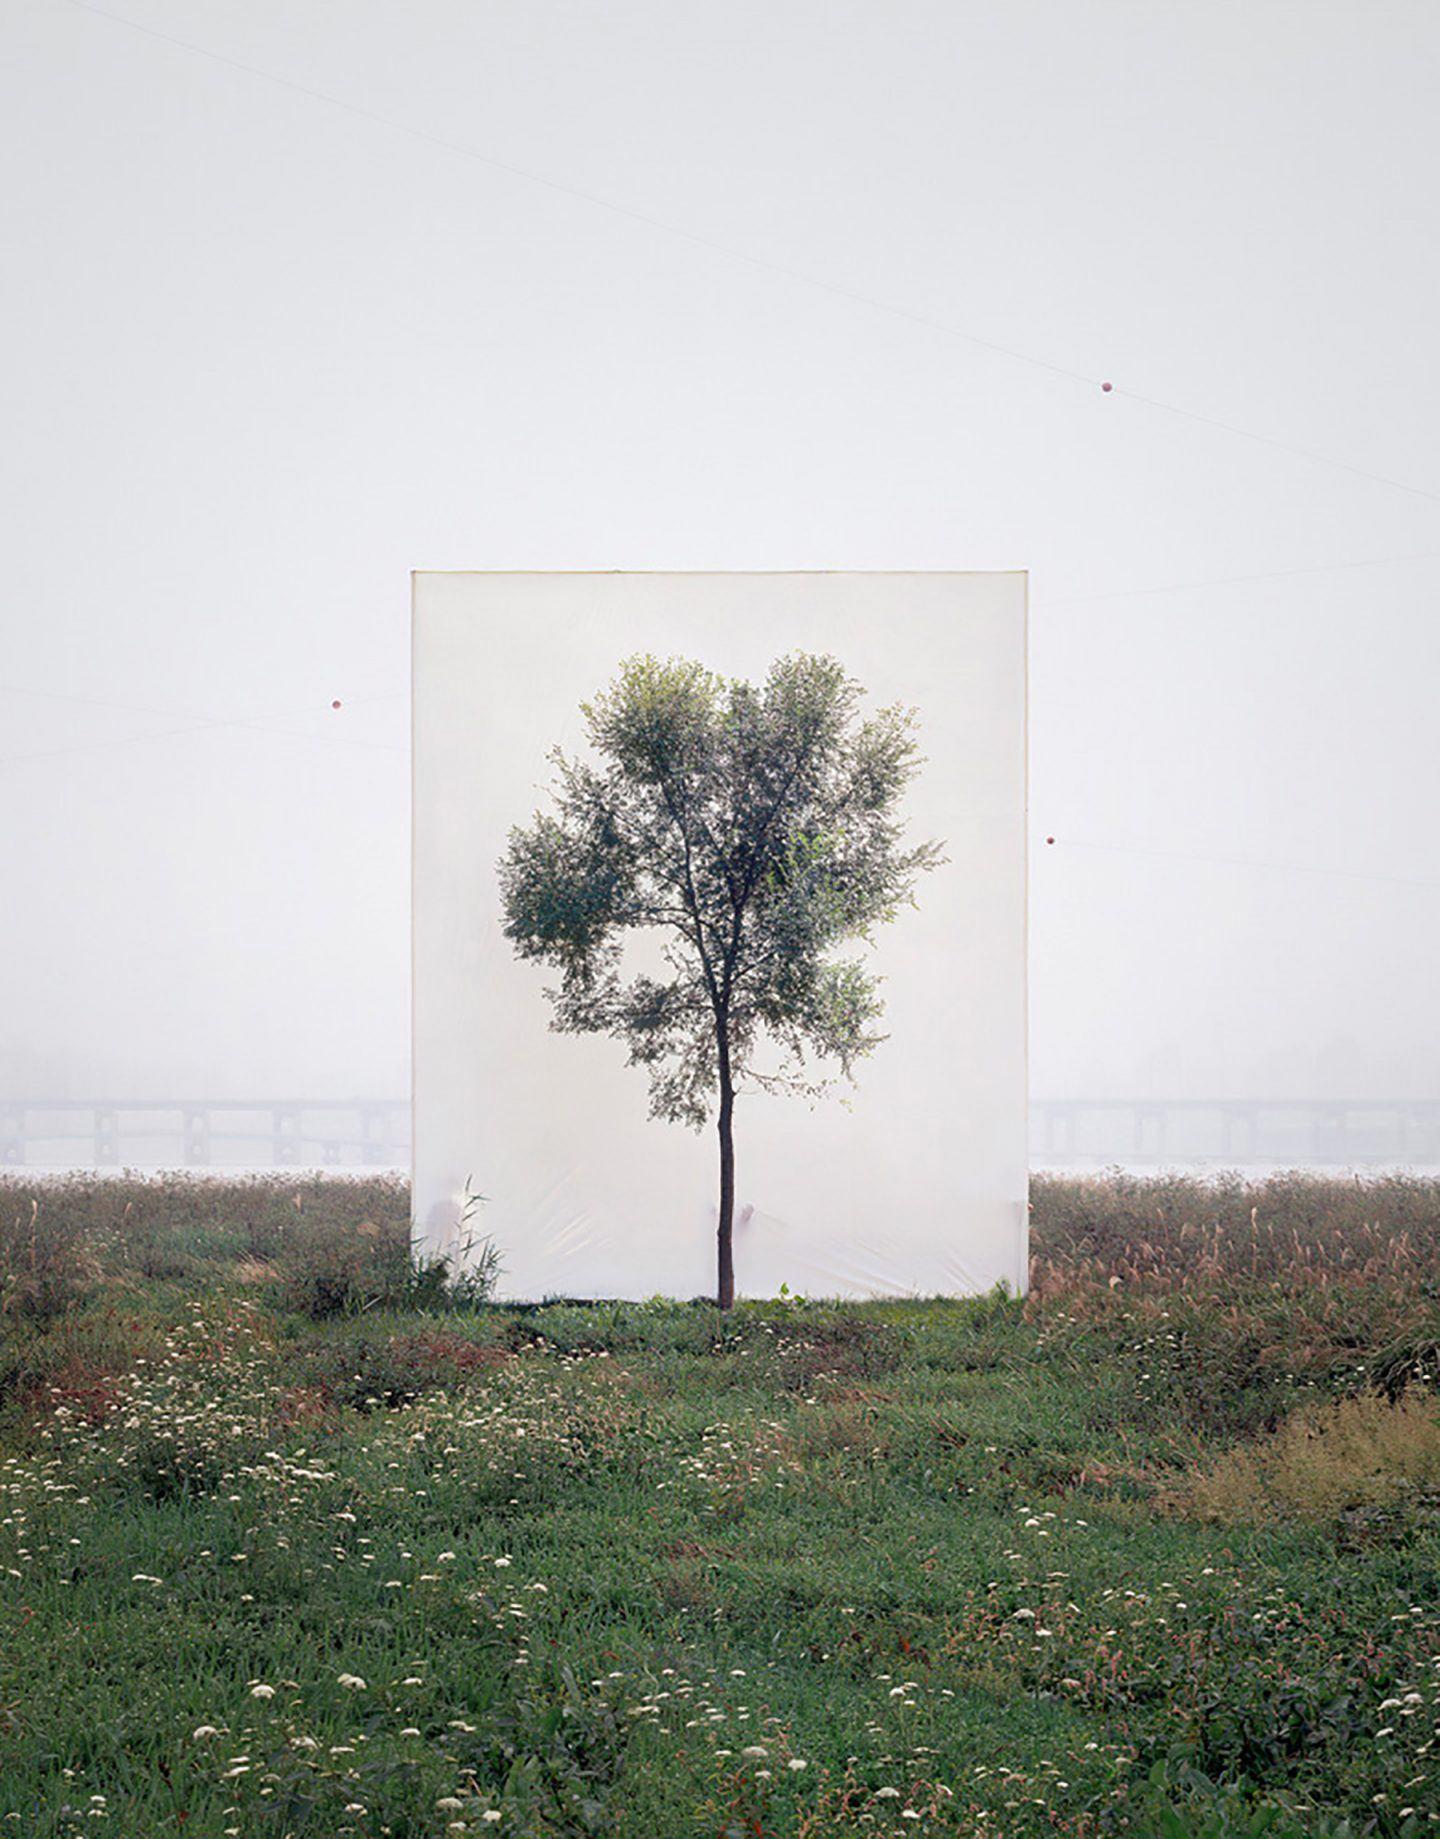 IGNANT-Art-Myoung-Ho-Lee-Tree-8